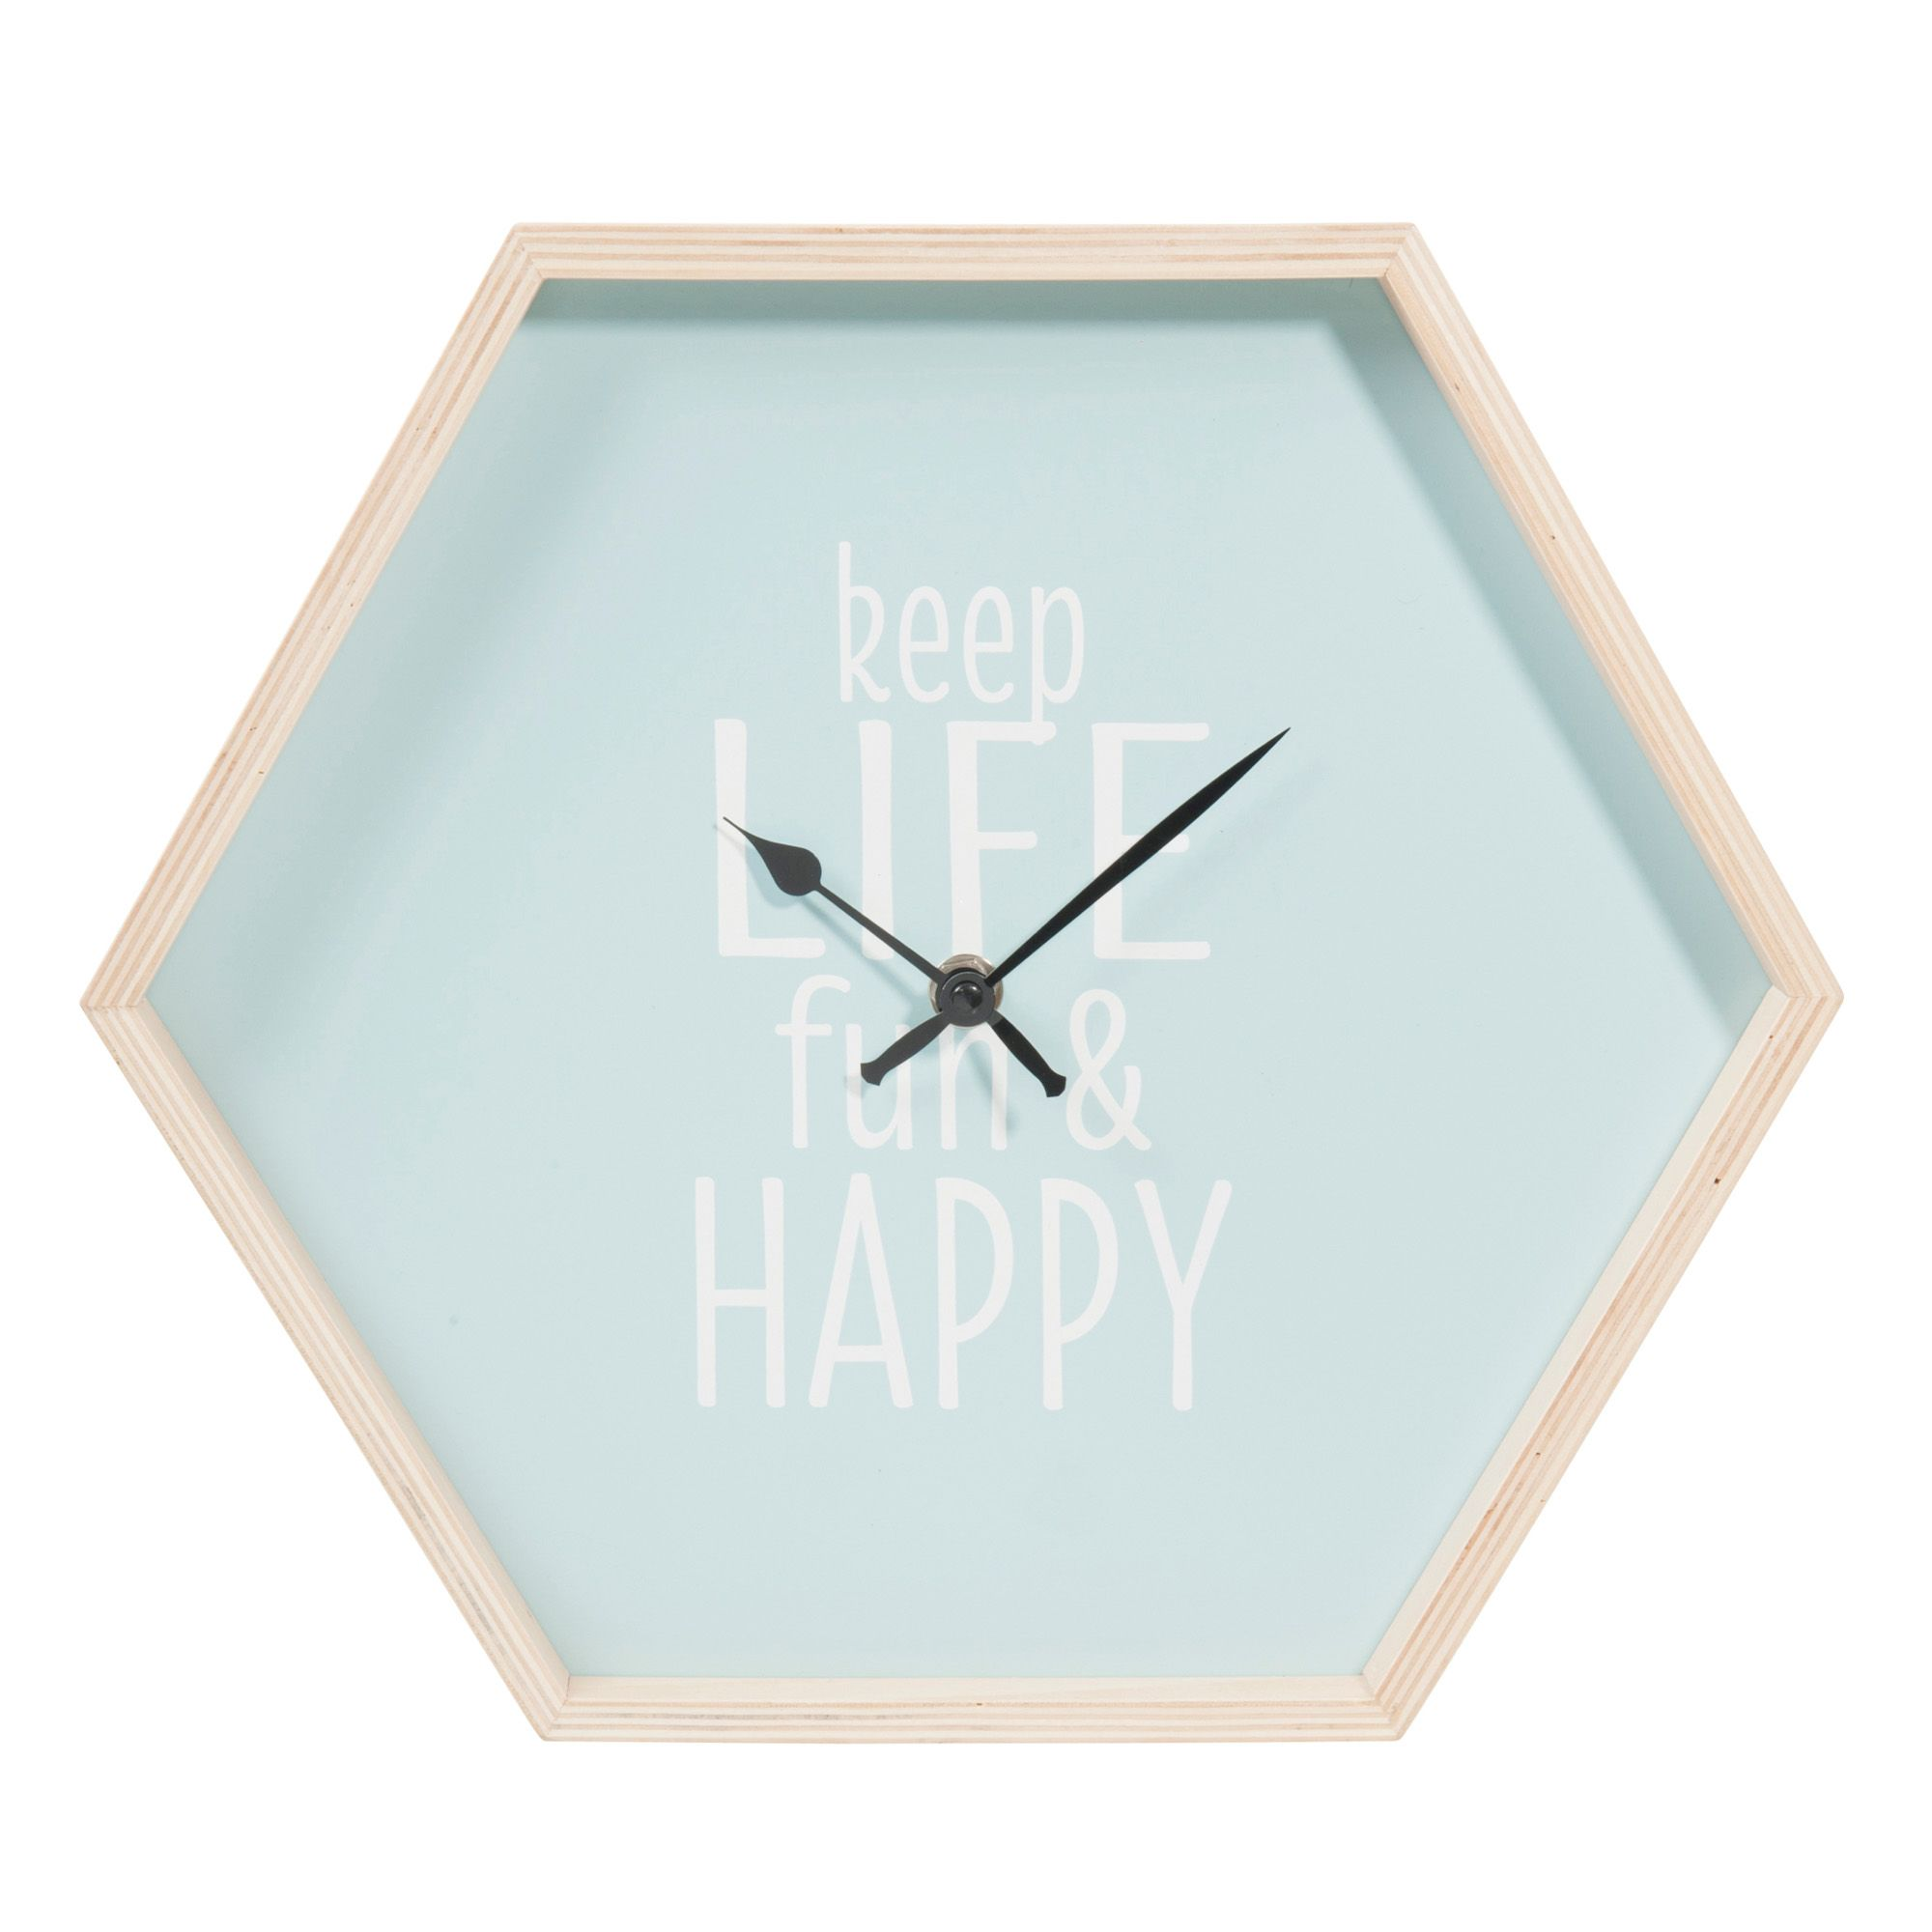 horloge hexagonale en bois bleu d 32 cm keep life fun